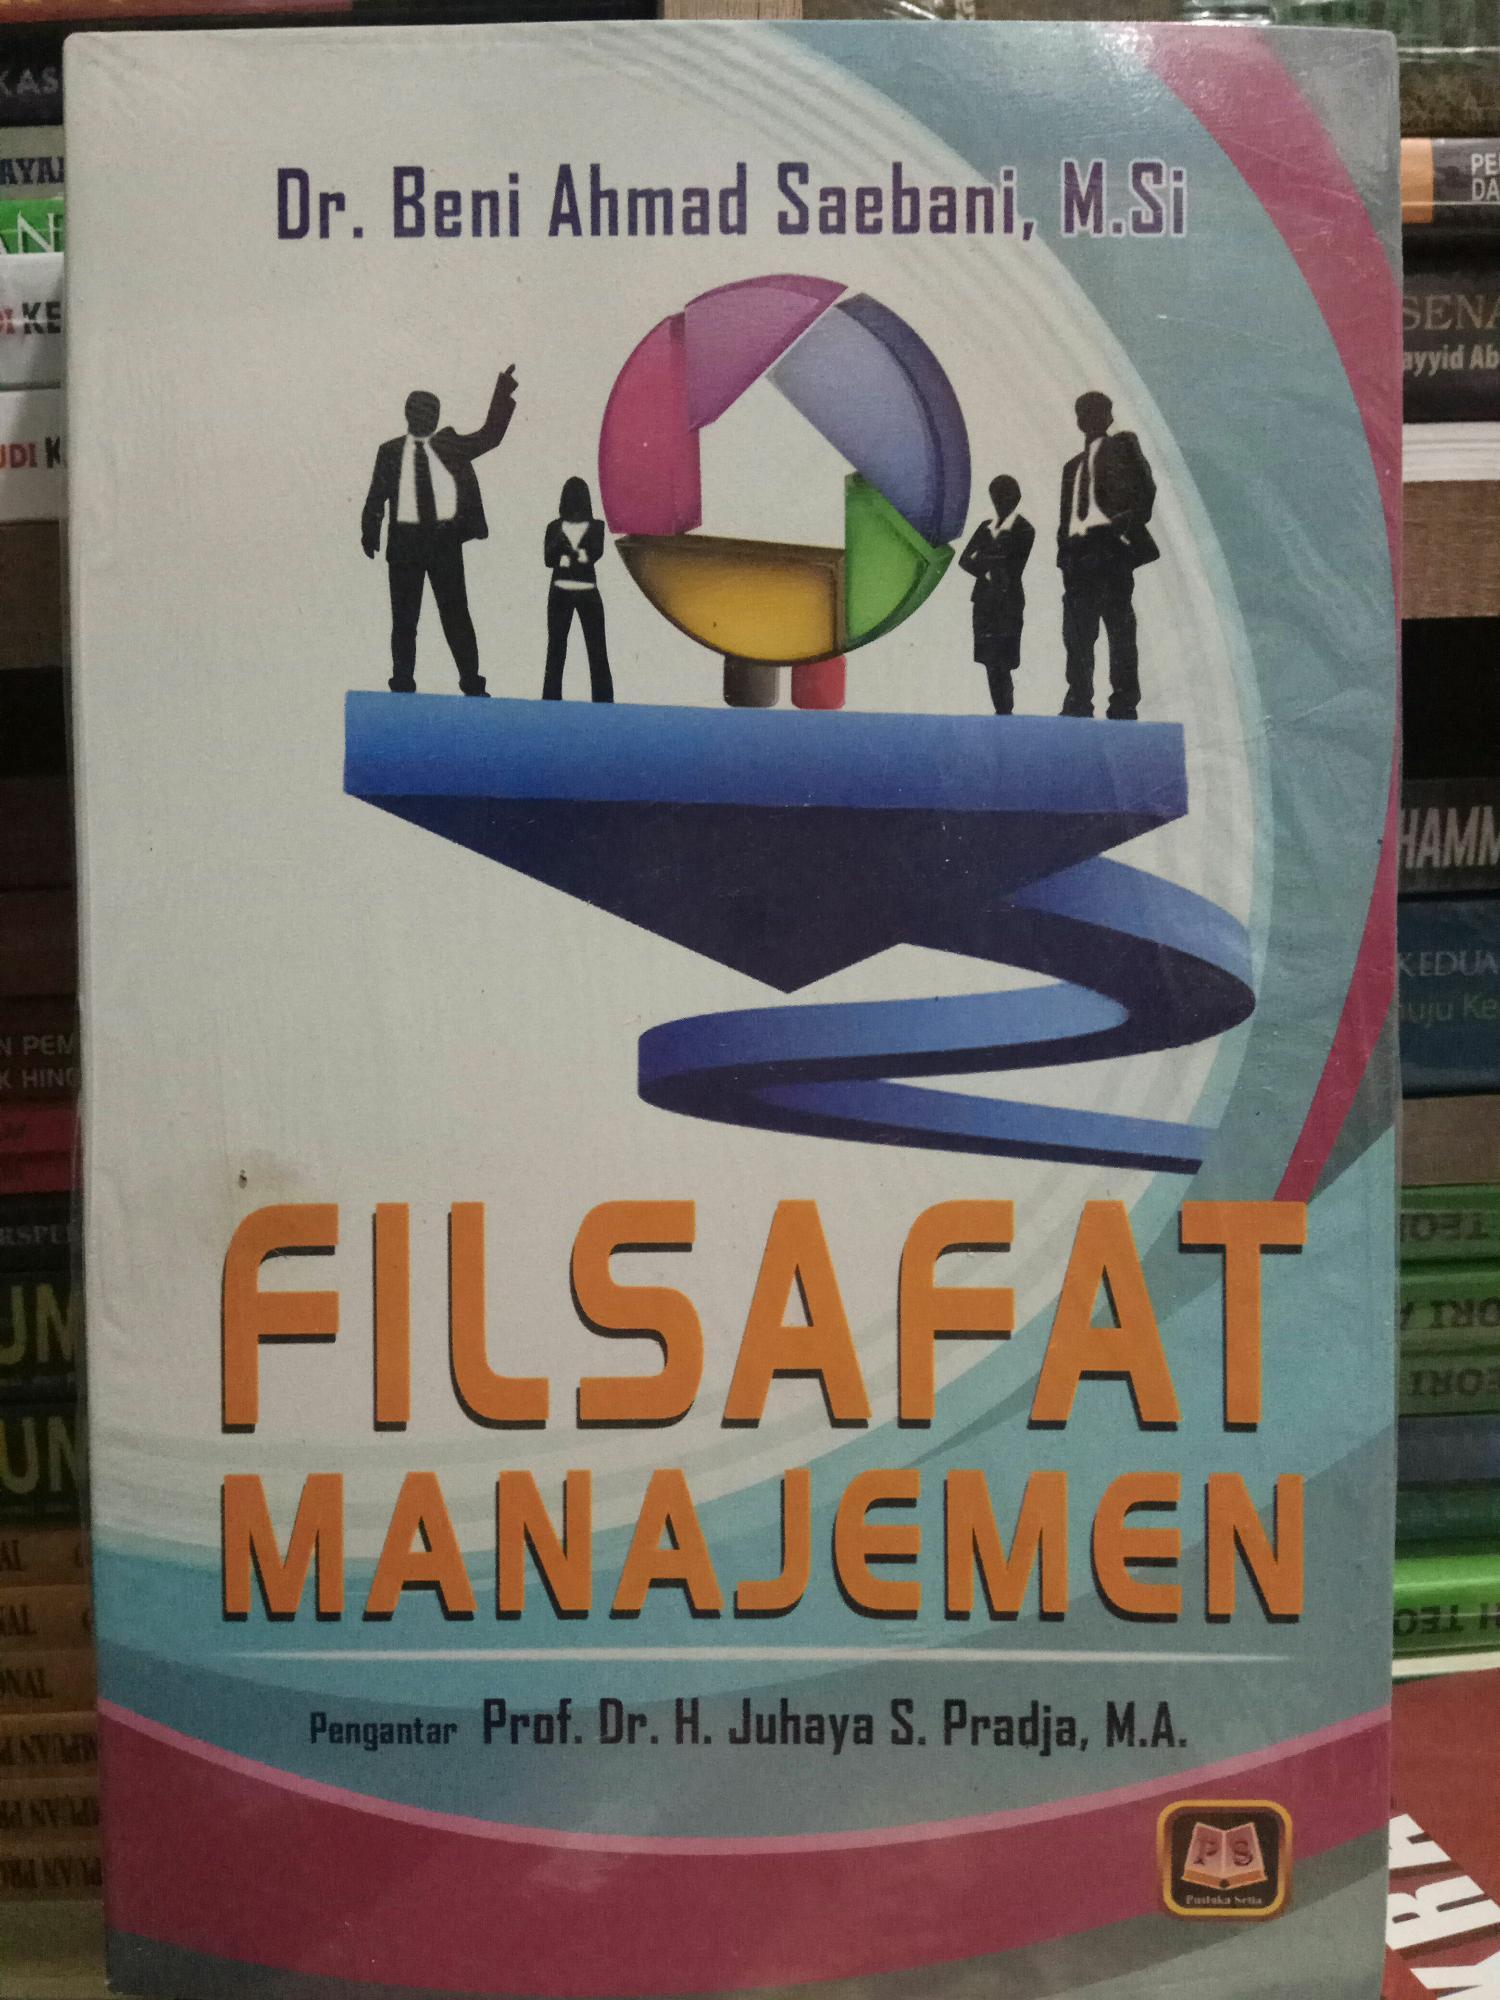 Buku Filsafat Manajemen - Beni Ahmad Saebani By Toko Buku Pustaka Hidayah.